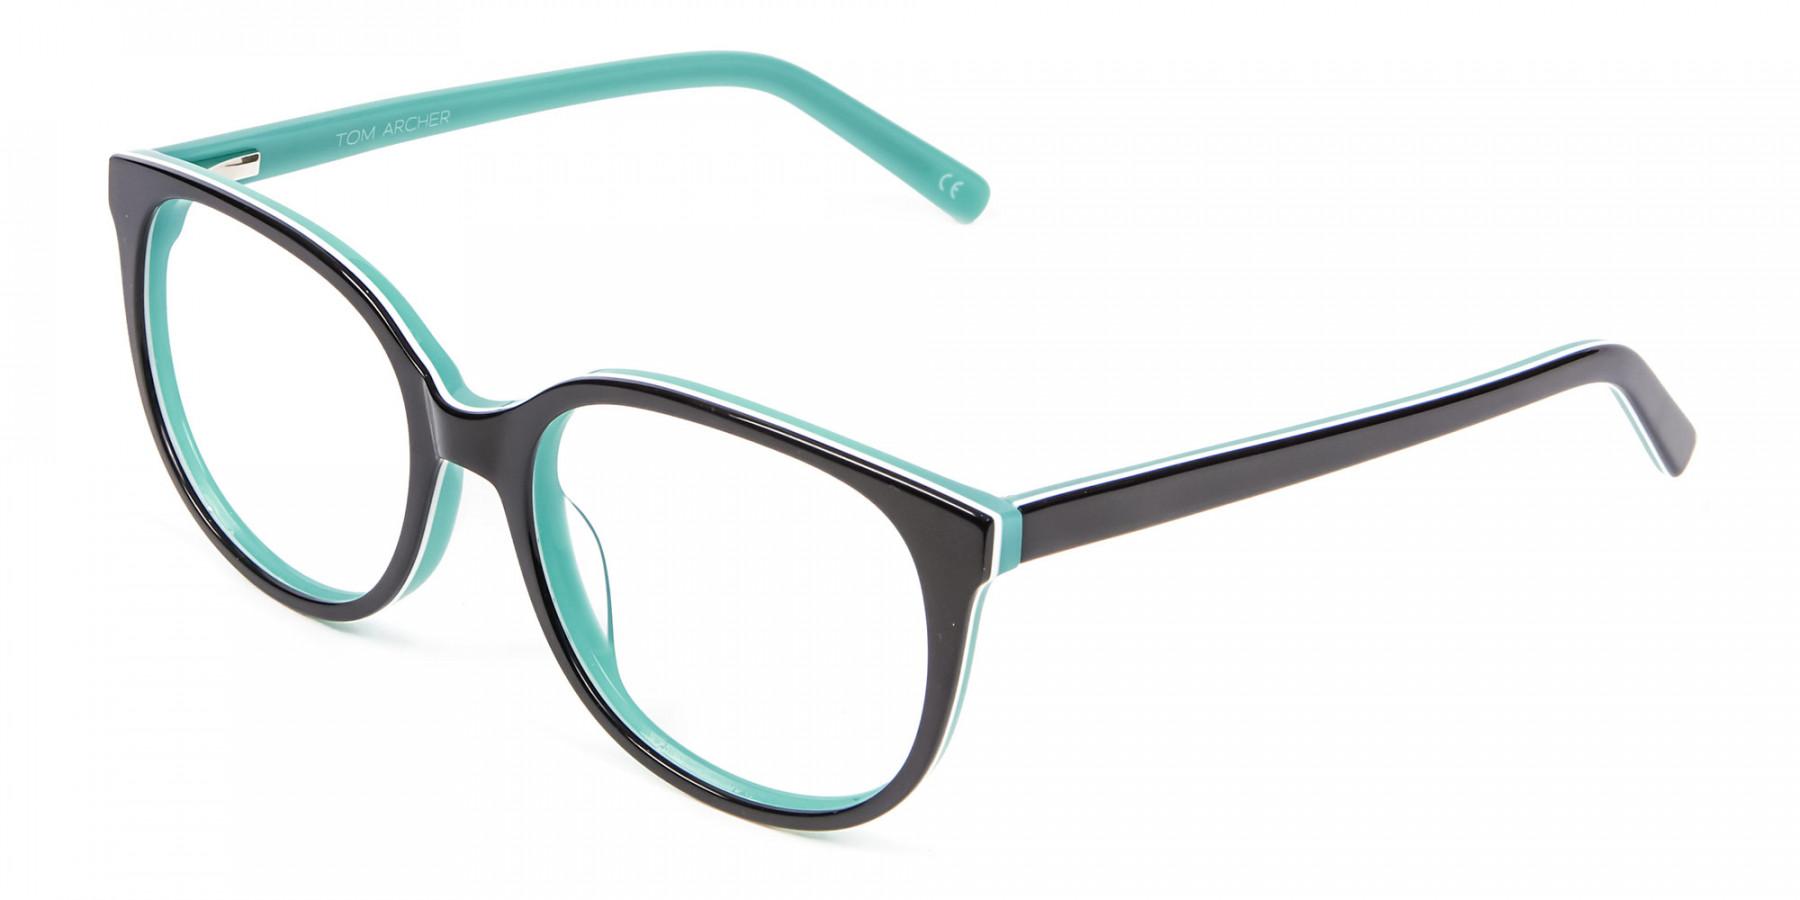 Wayfarer-Cateye Frame in Black and Mint Green